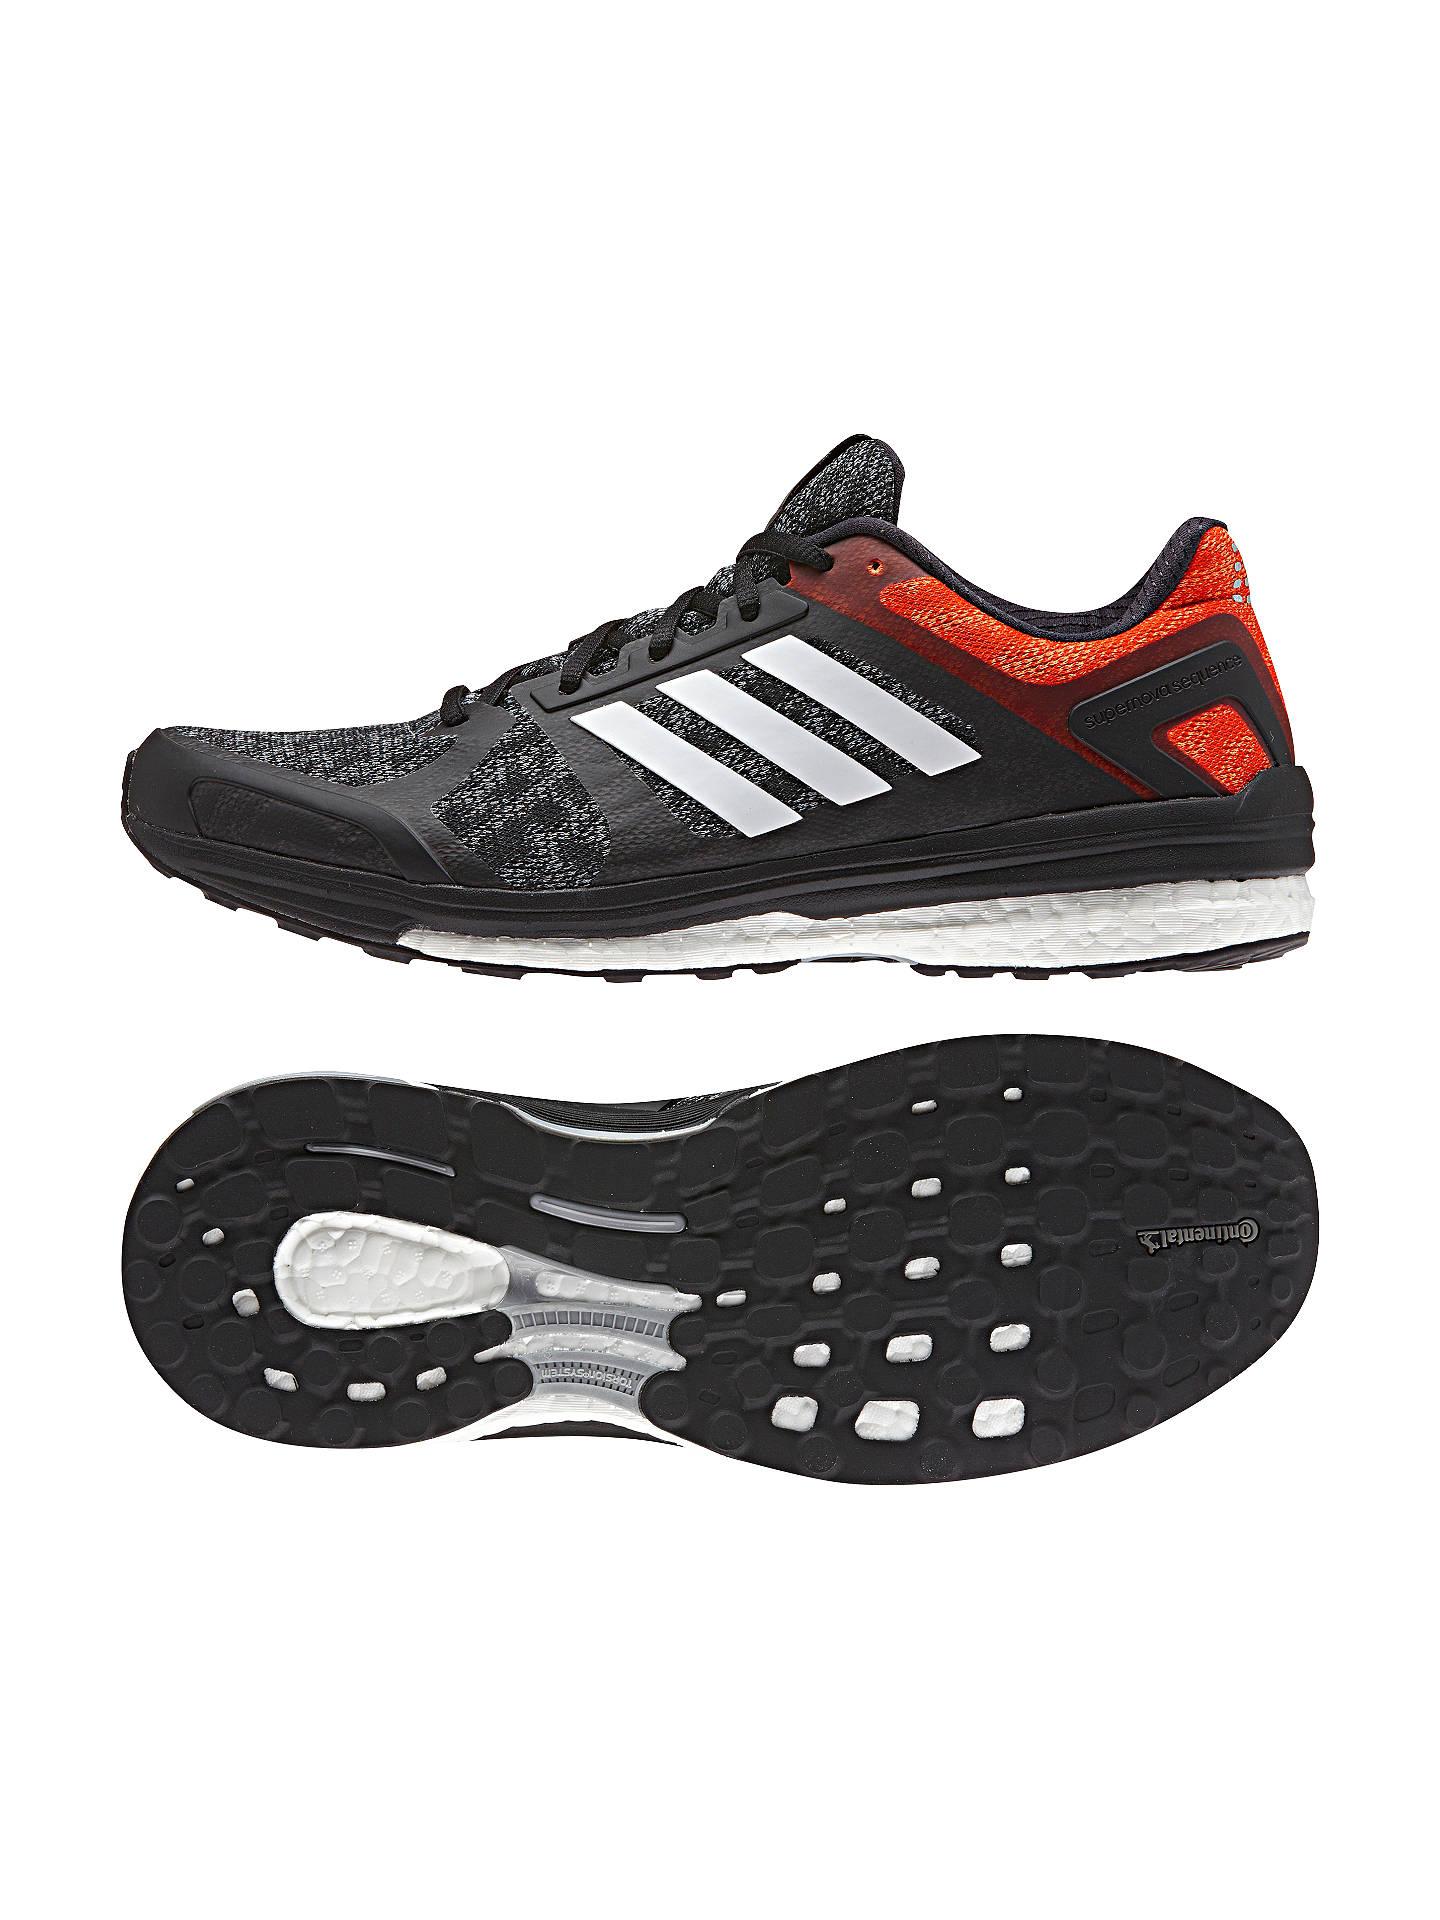 Details about Adidas Supernova Sequence Boost Men's Running Shoe Size 9 12 Black Orange